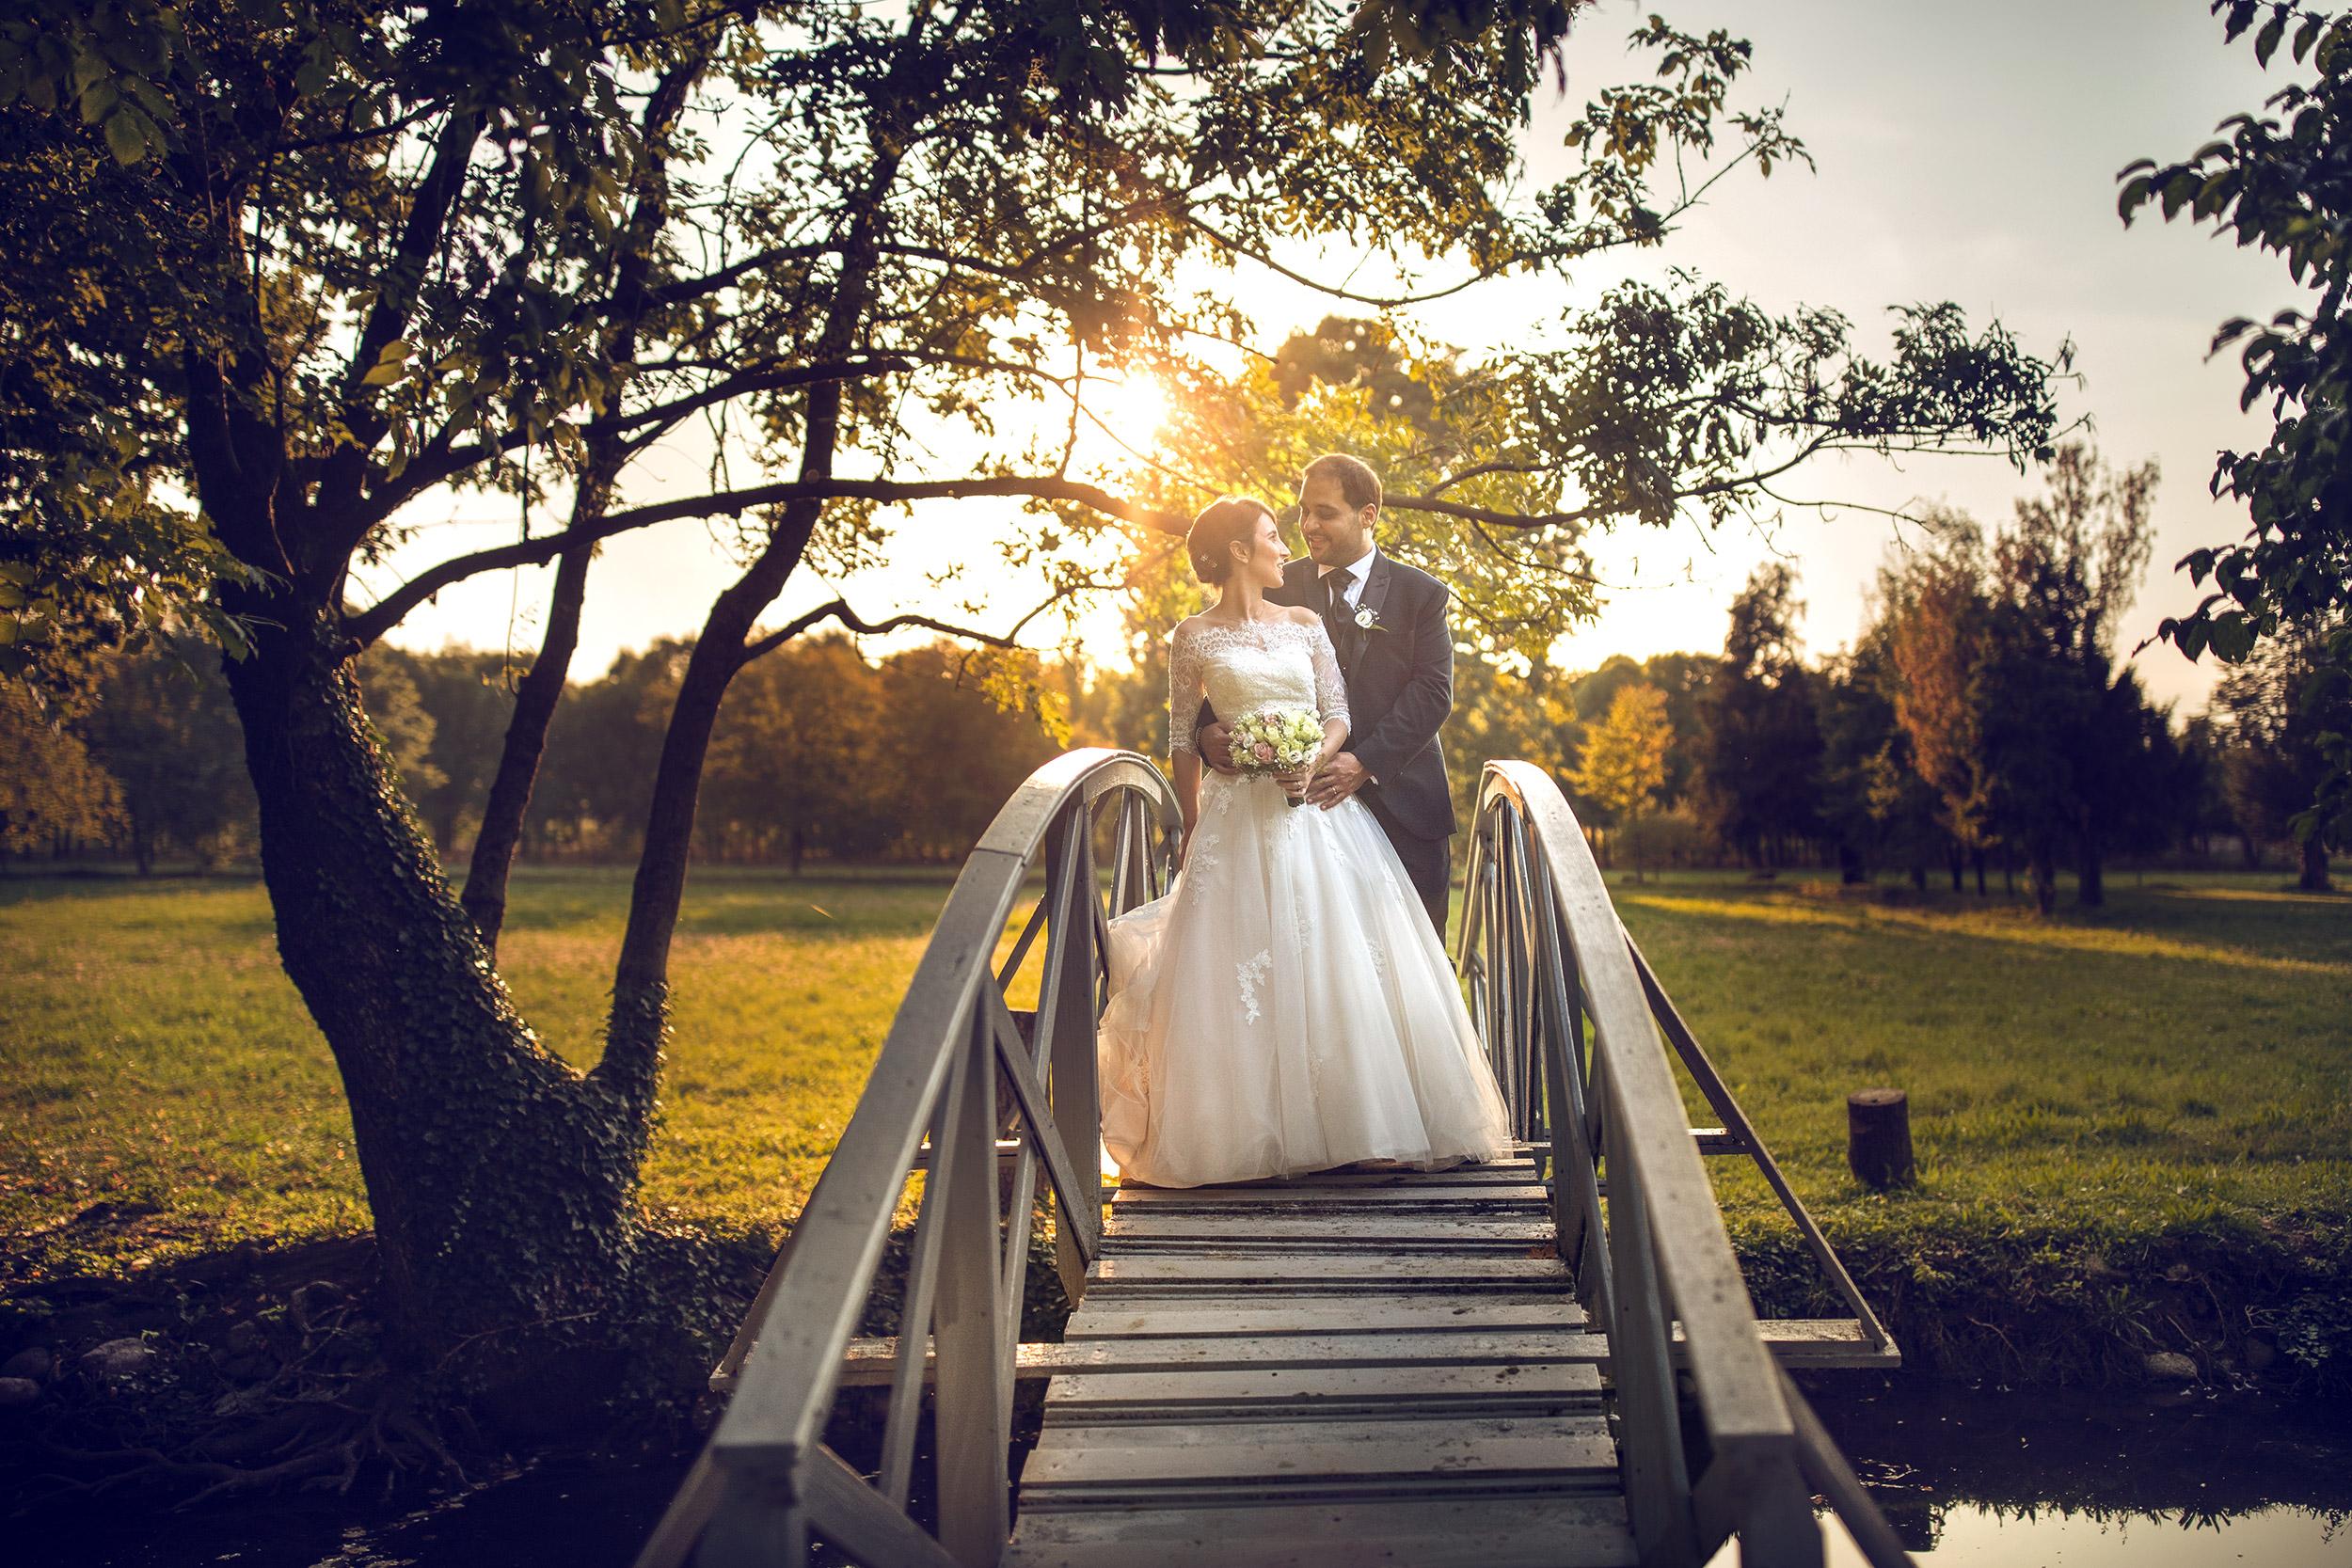 000 reportage sposi foto matrimonio wedding castello cavernago bergamo 1